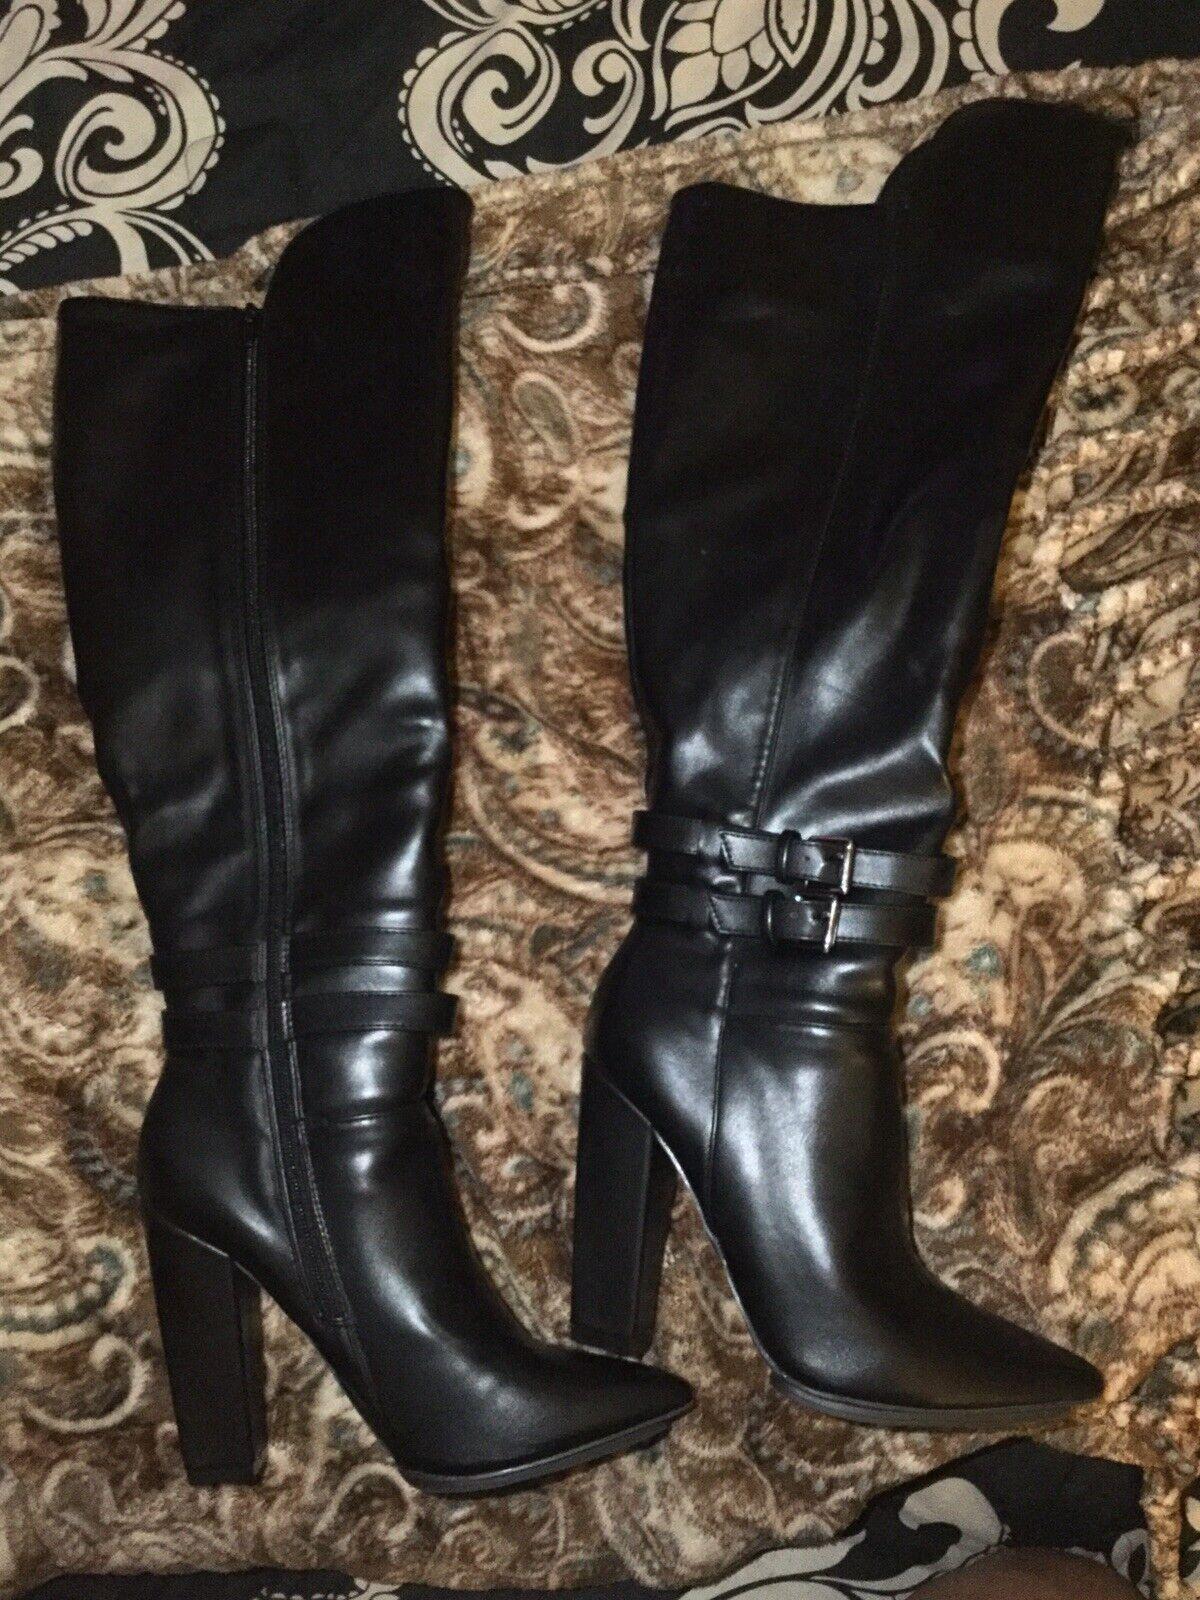 Offriamo vari marchi famosi Felicity nero Leather Knee Knee Knee High stivali,Dimensione 7.5 Heeled  a prezzi accessibili